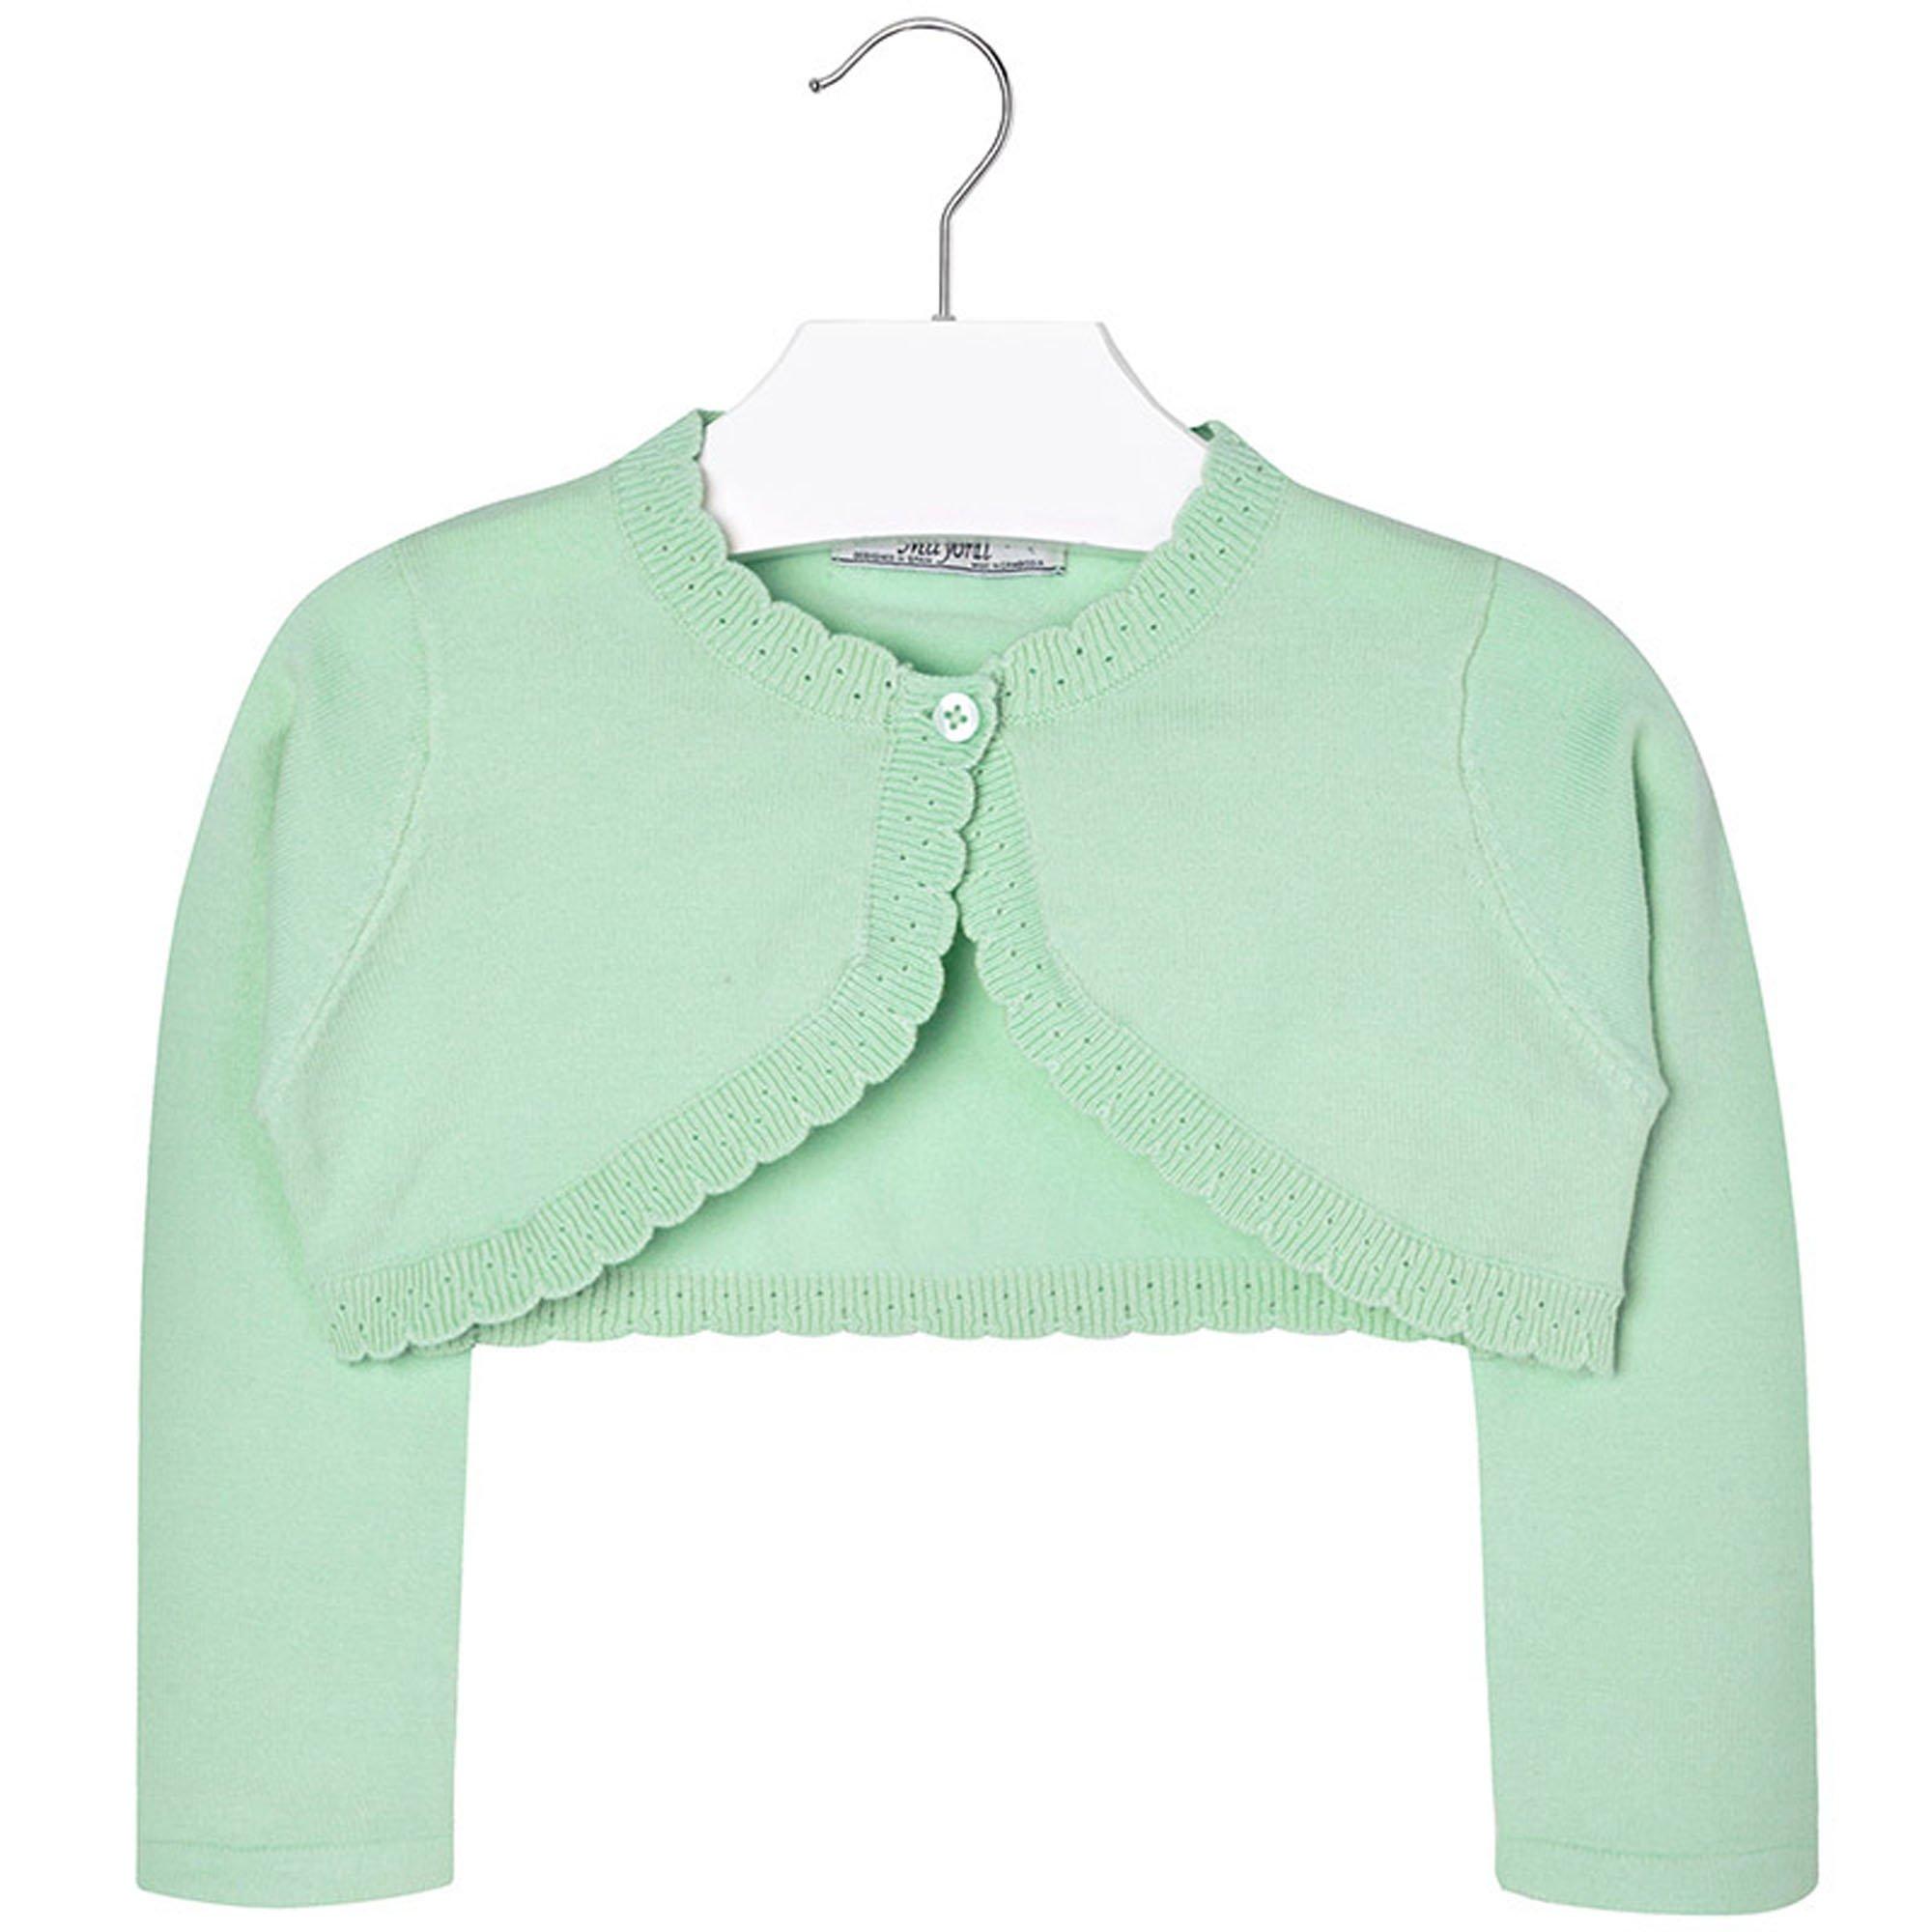 Mayoral Girls 2T-9 Apple-Green Scallop Edge Knit Shrug Cardigan Sweater, Apple,4